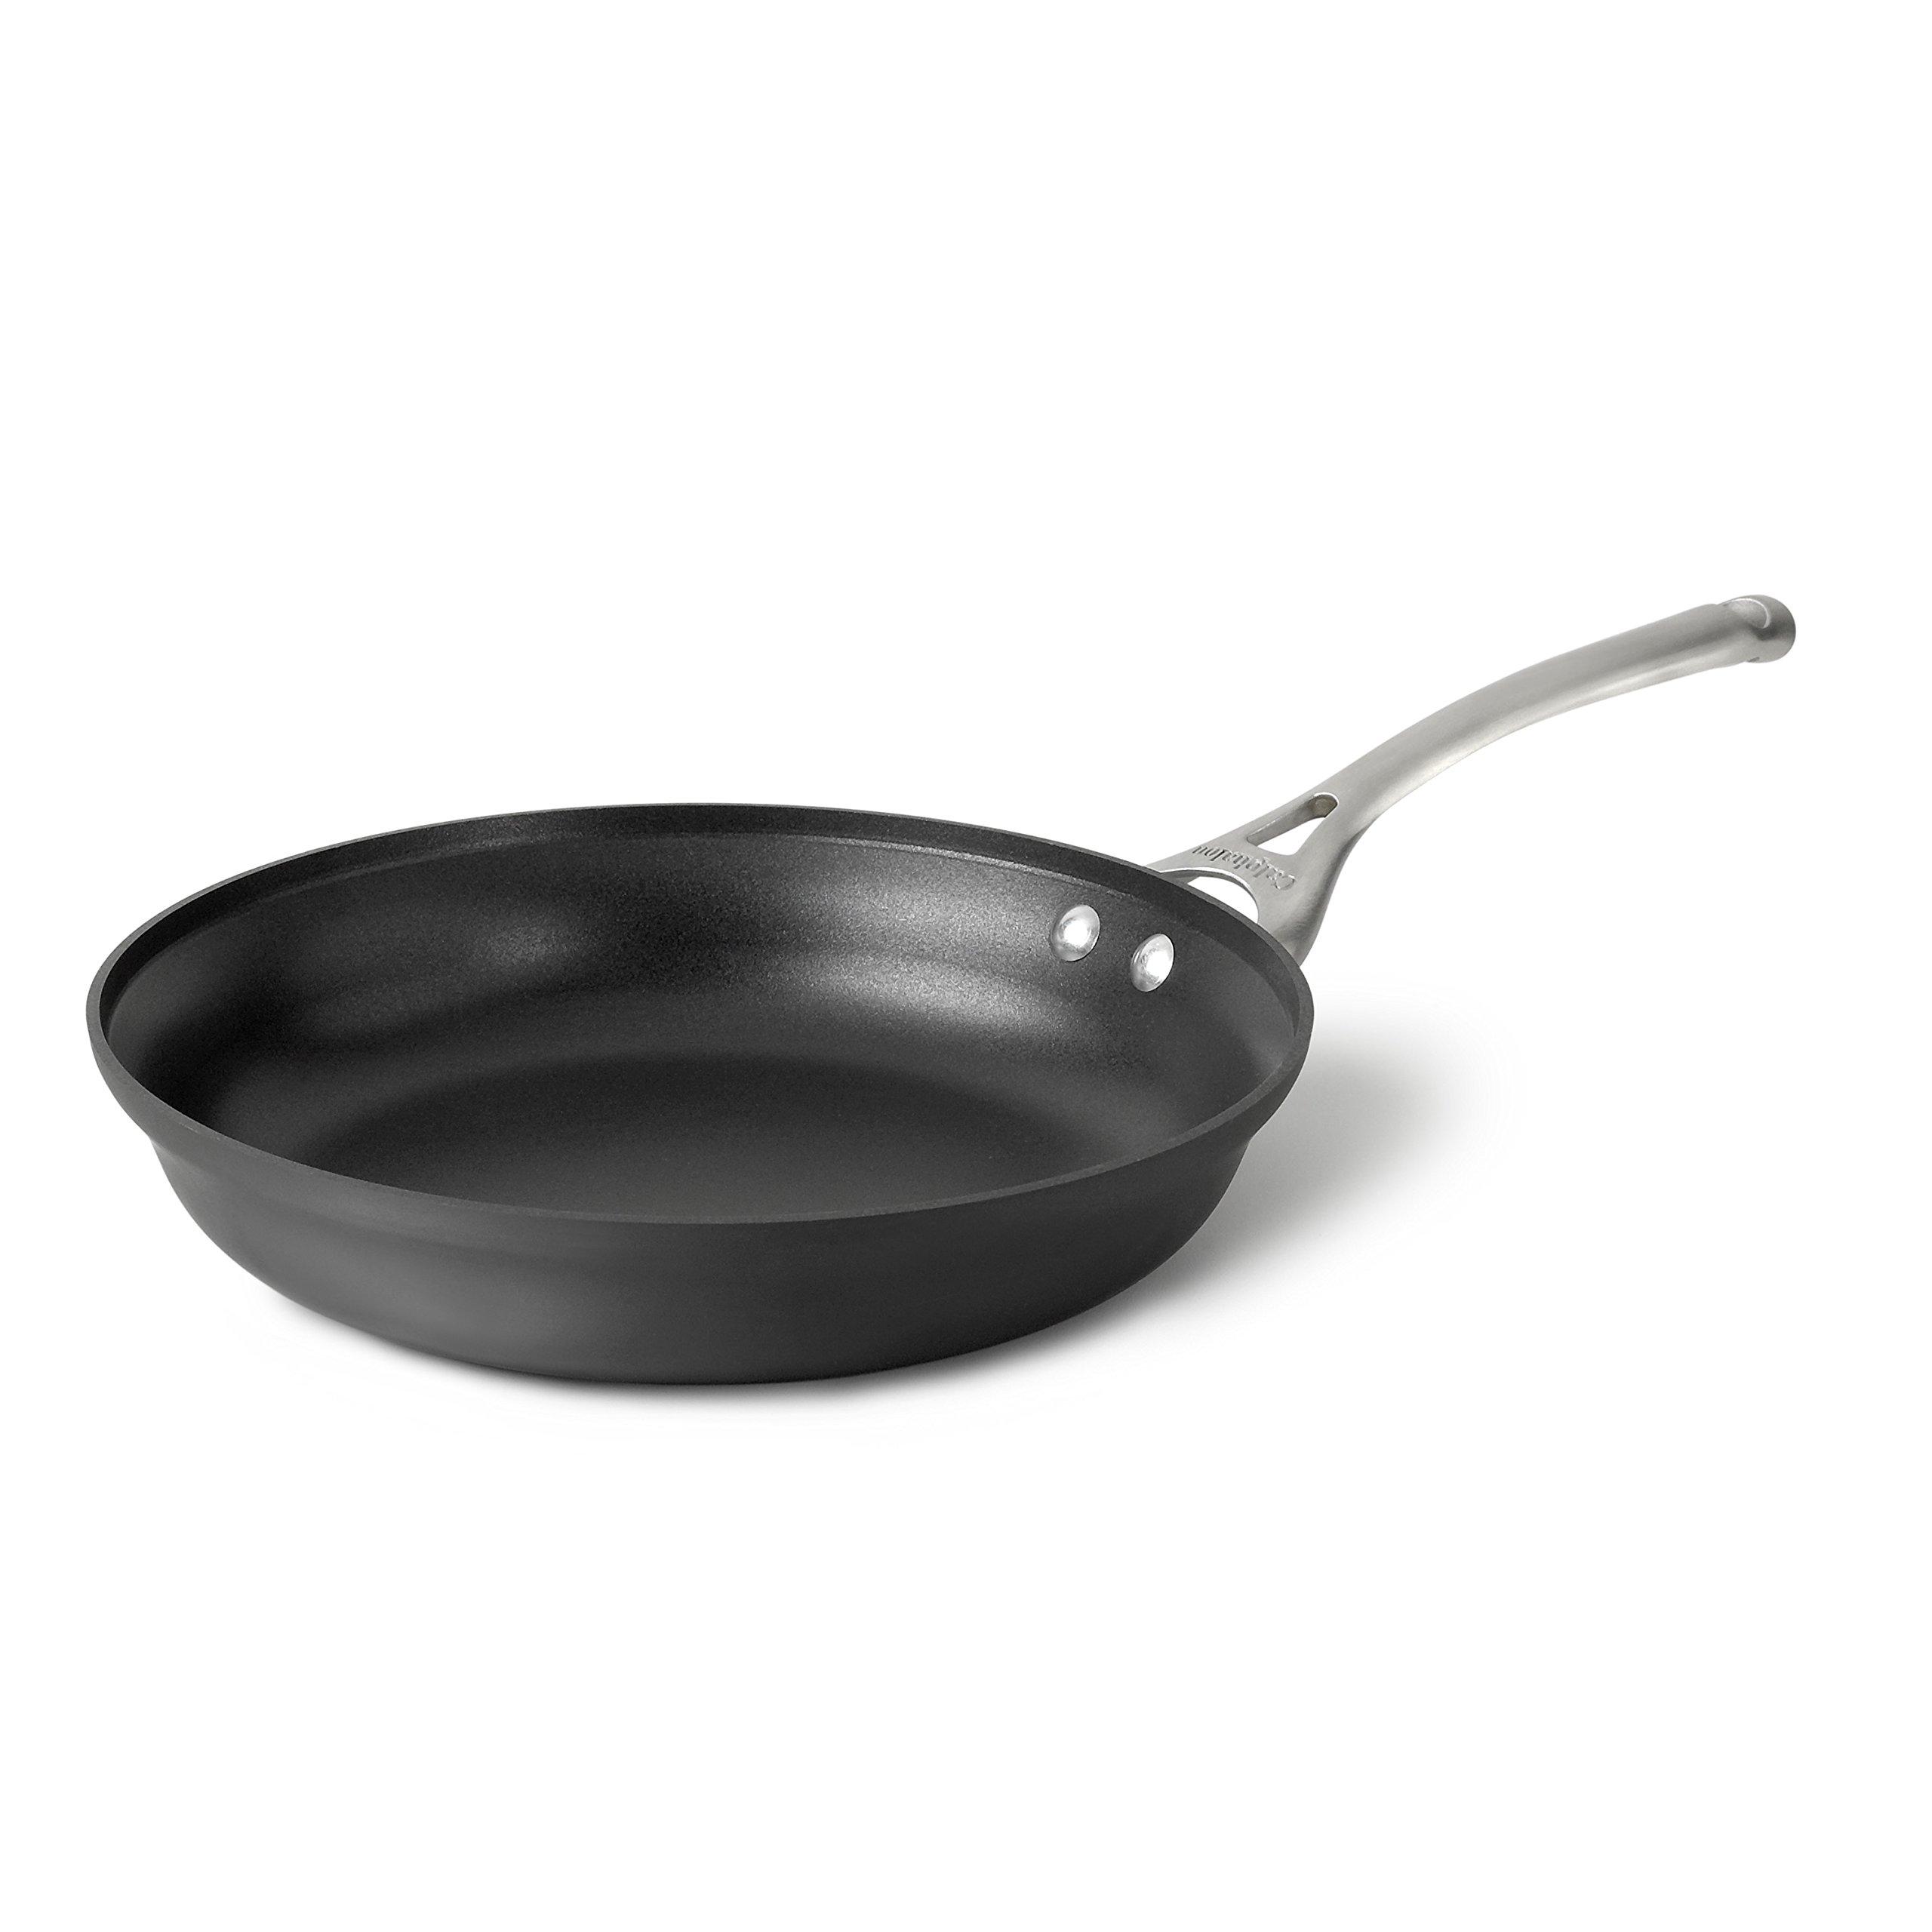 Calphalon Contemporary Hard-Anodized Aluminum Nonstick Cookware, Omelette Pan, 12-inch, Black by Calphalon